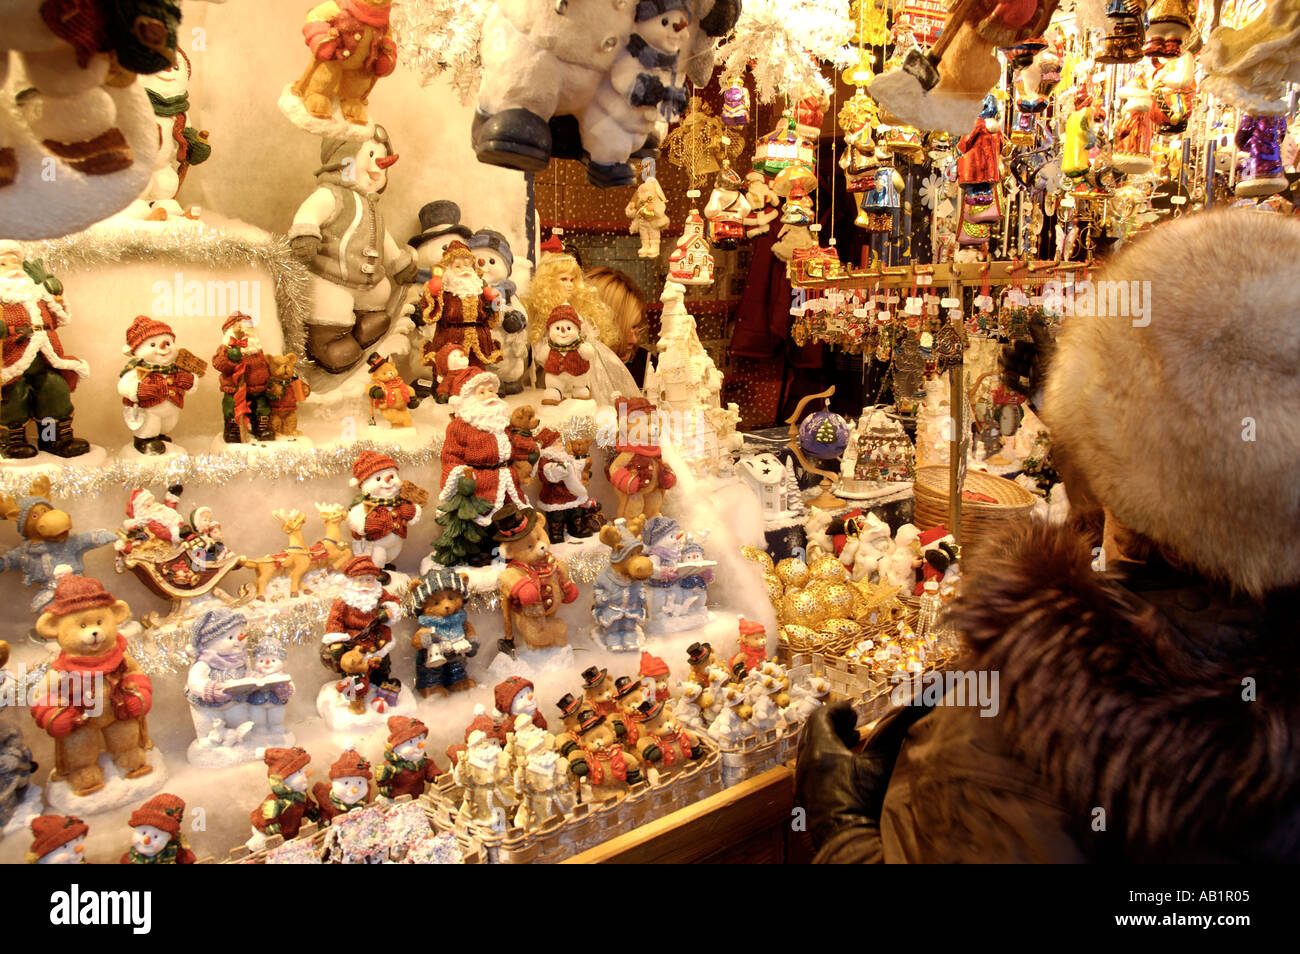 Weihnachtsmarkt Nürnberg.Germany Bavaria Bayern Nürnberg Nuremberg Christmas Market Stock